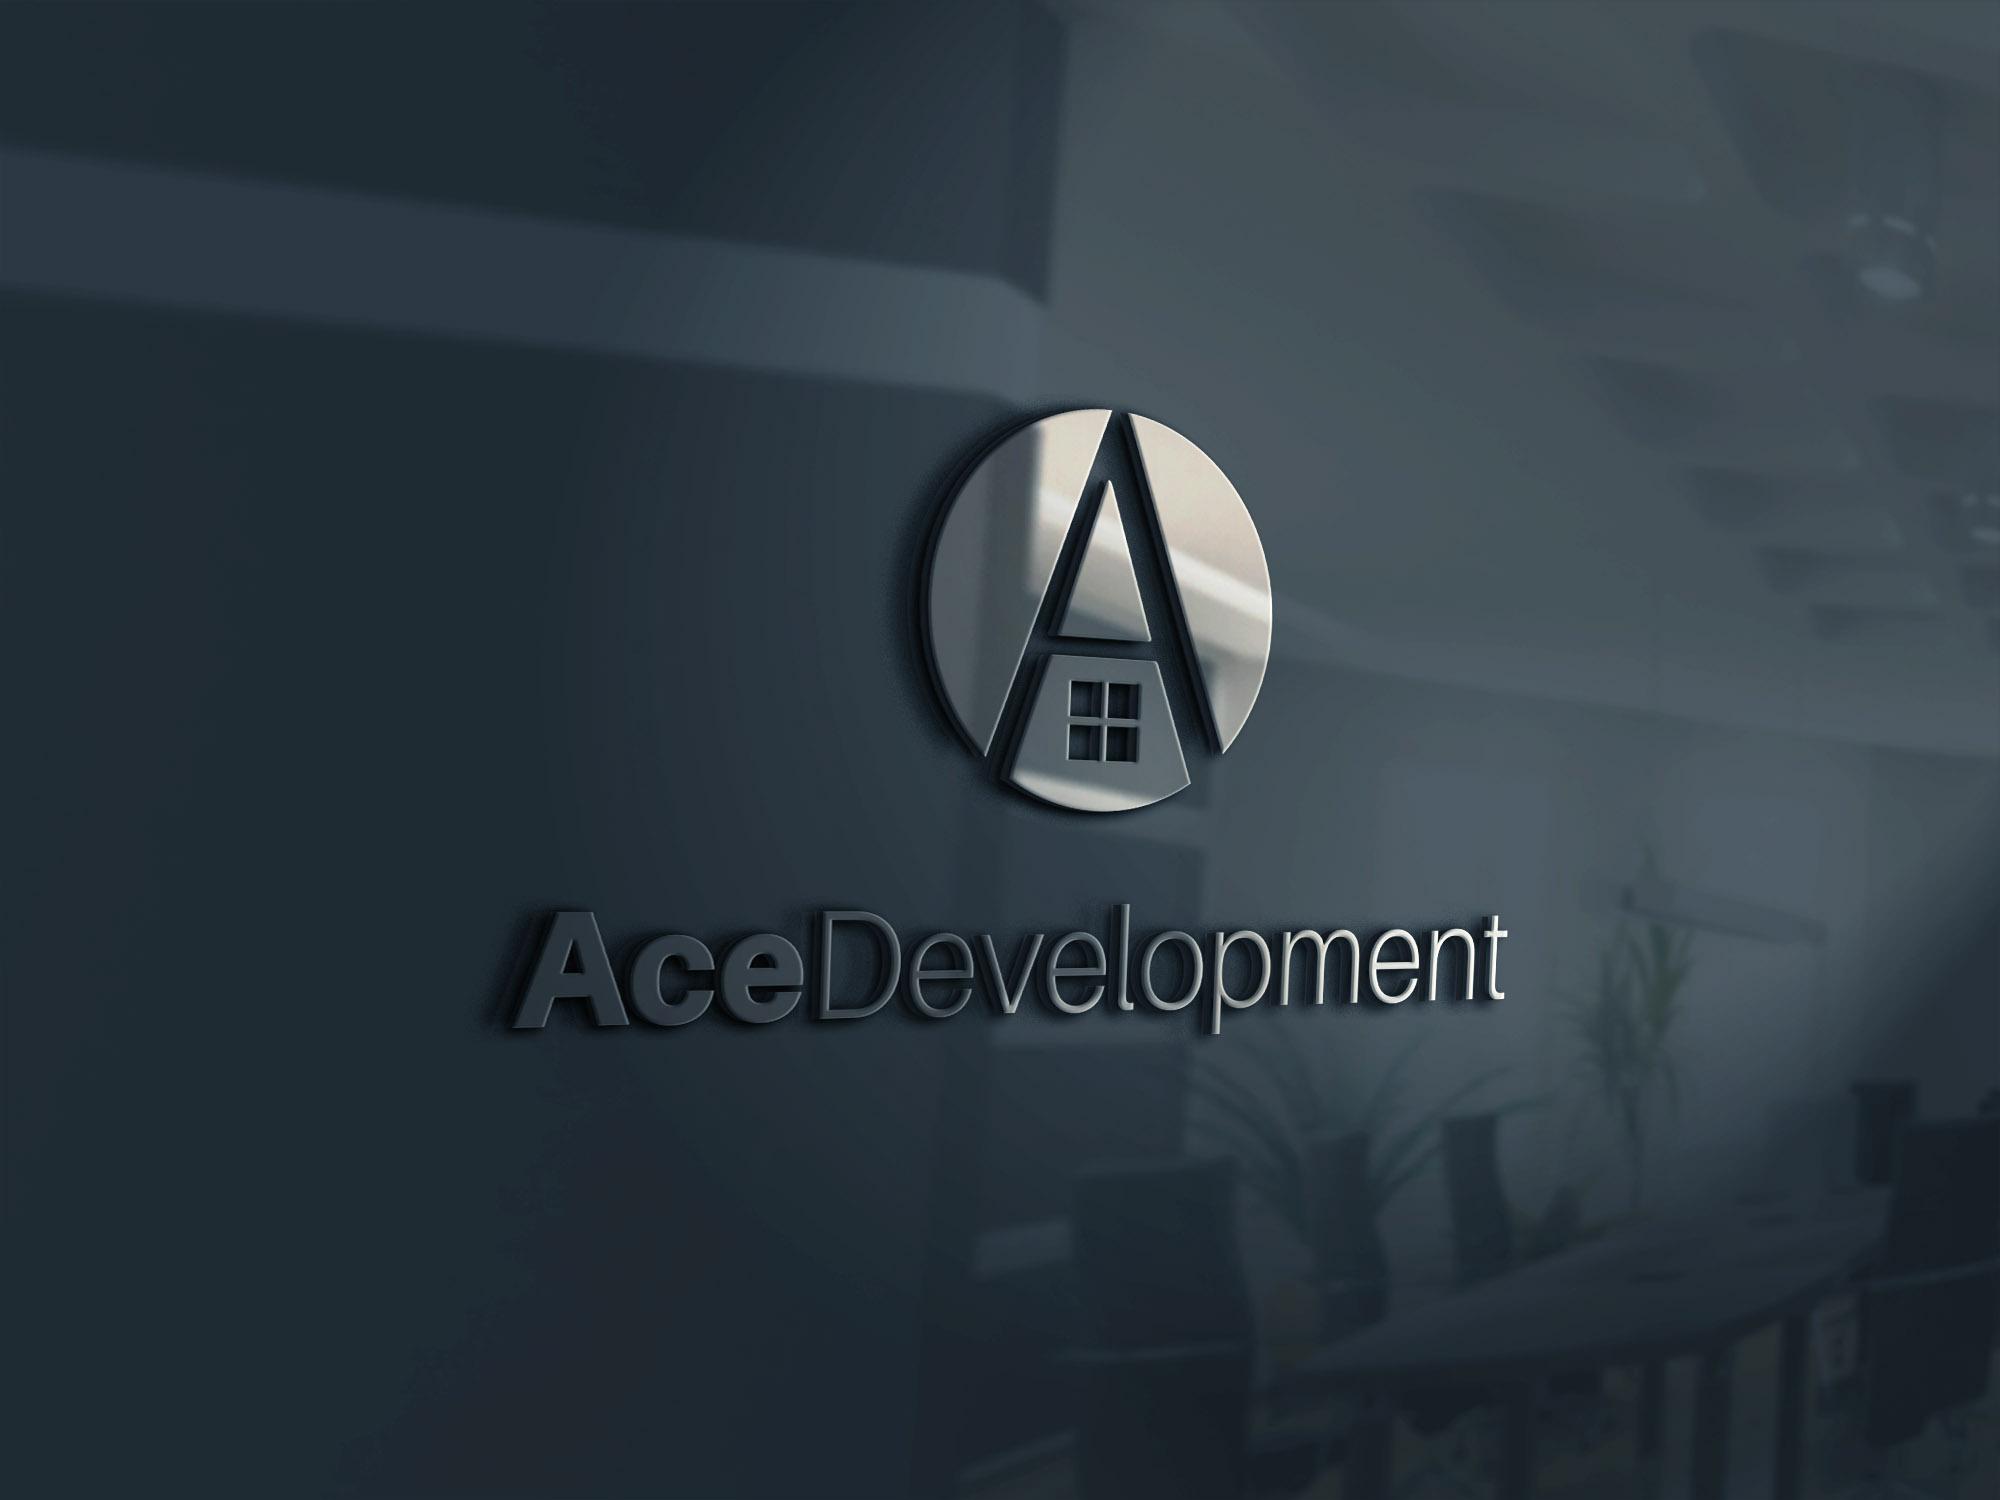 Logo Design by 354studio - Entry No. 52 in the Logo Design Contest Fun Logo Design for Ace development.